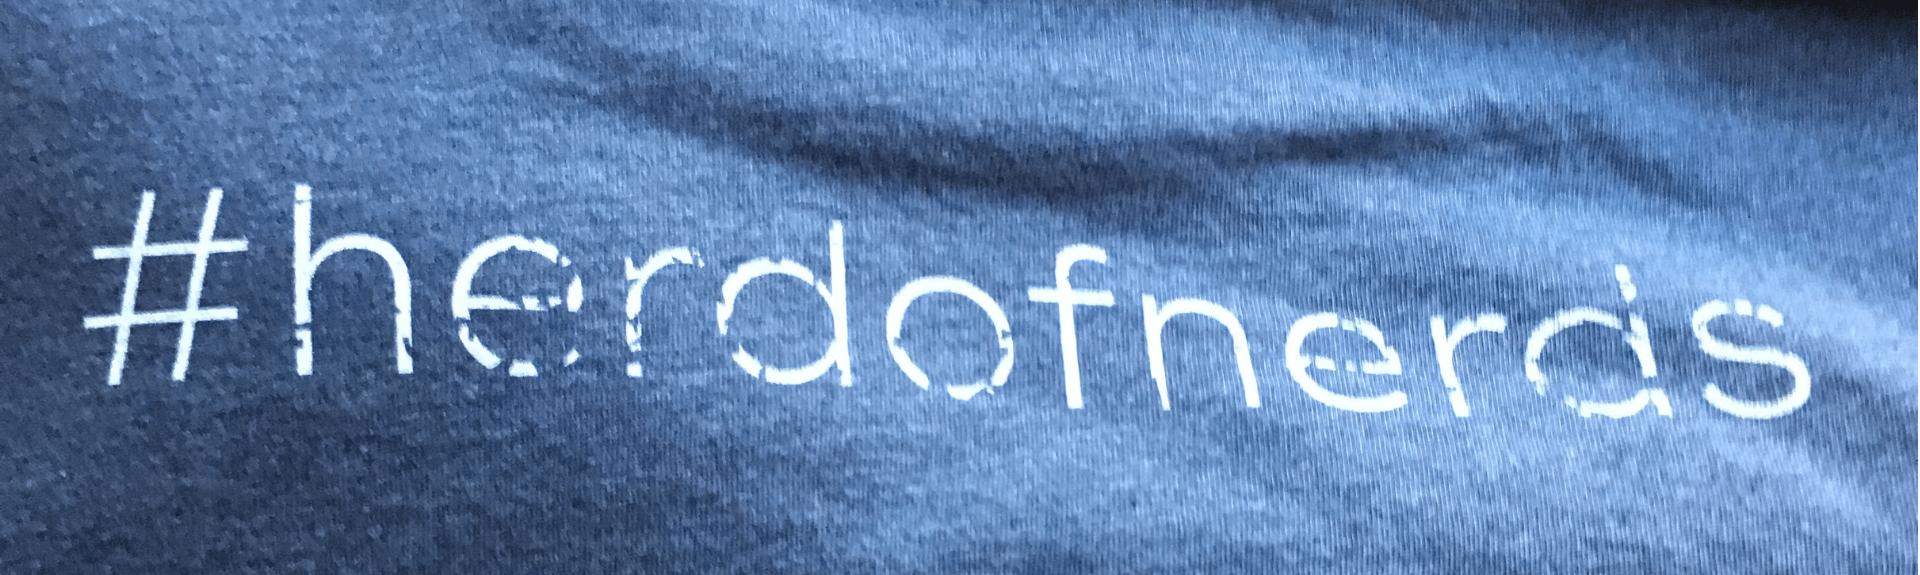 digital marketing_herd of nerds_analyticsthat profit